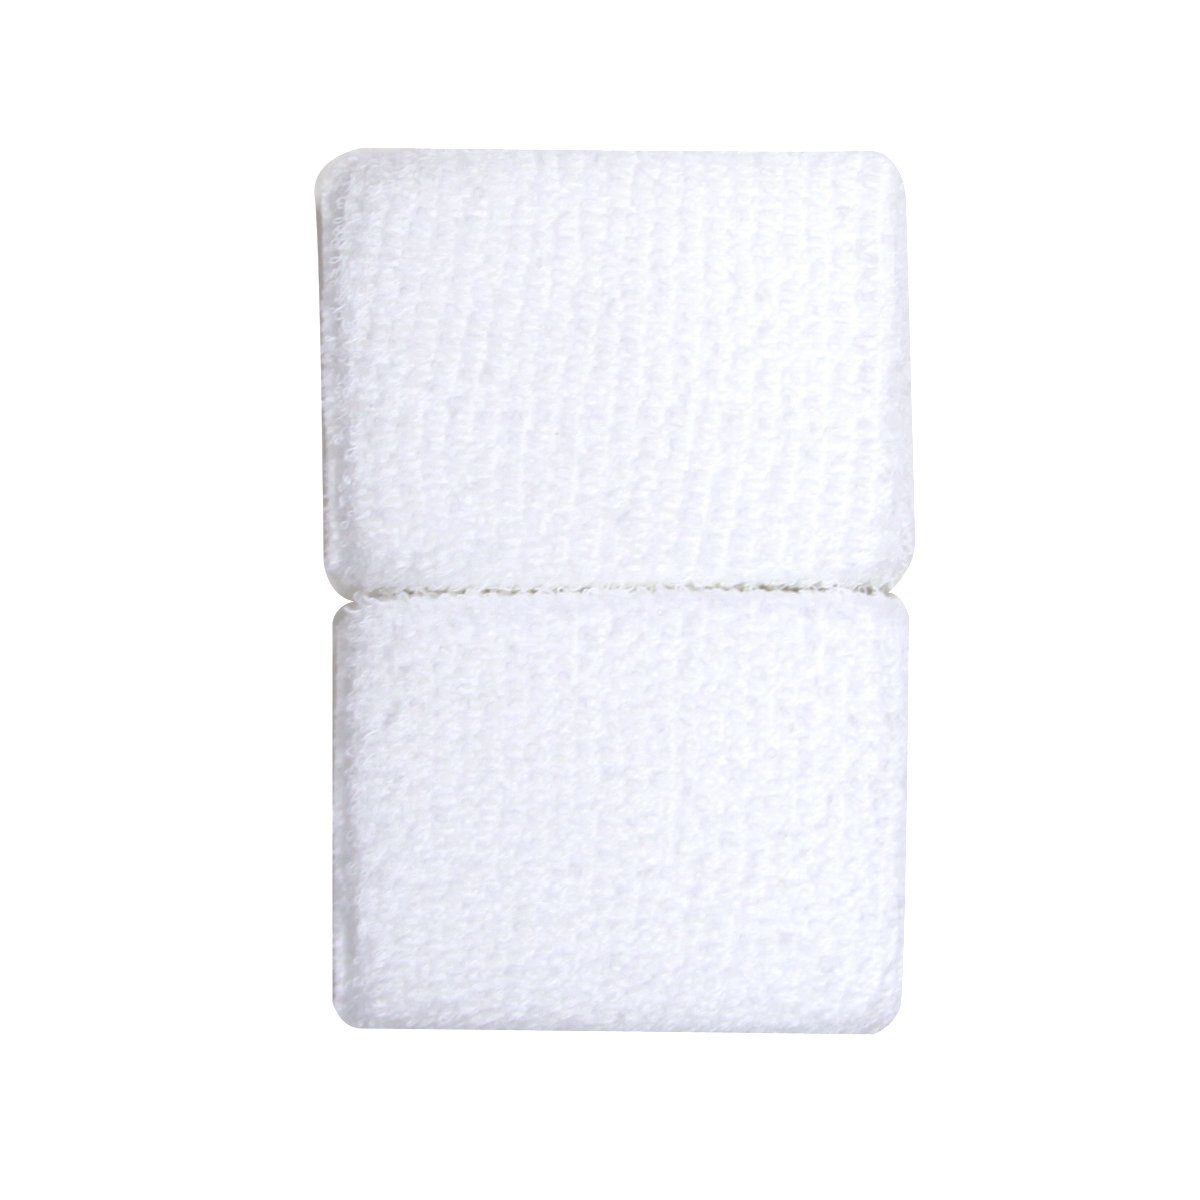 Trimaco SuperTuff Staining Pad Sponge, 2 pack